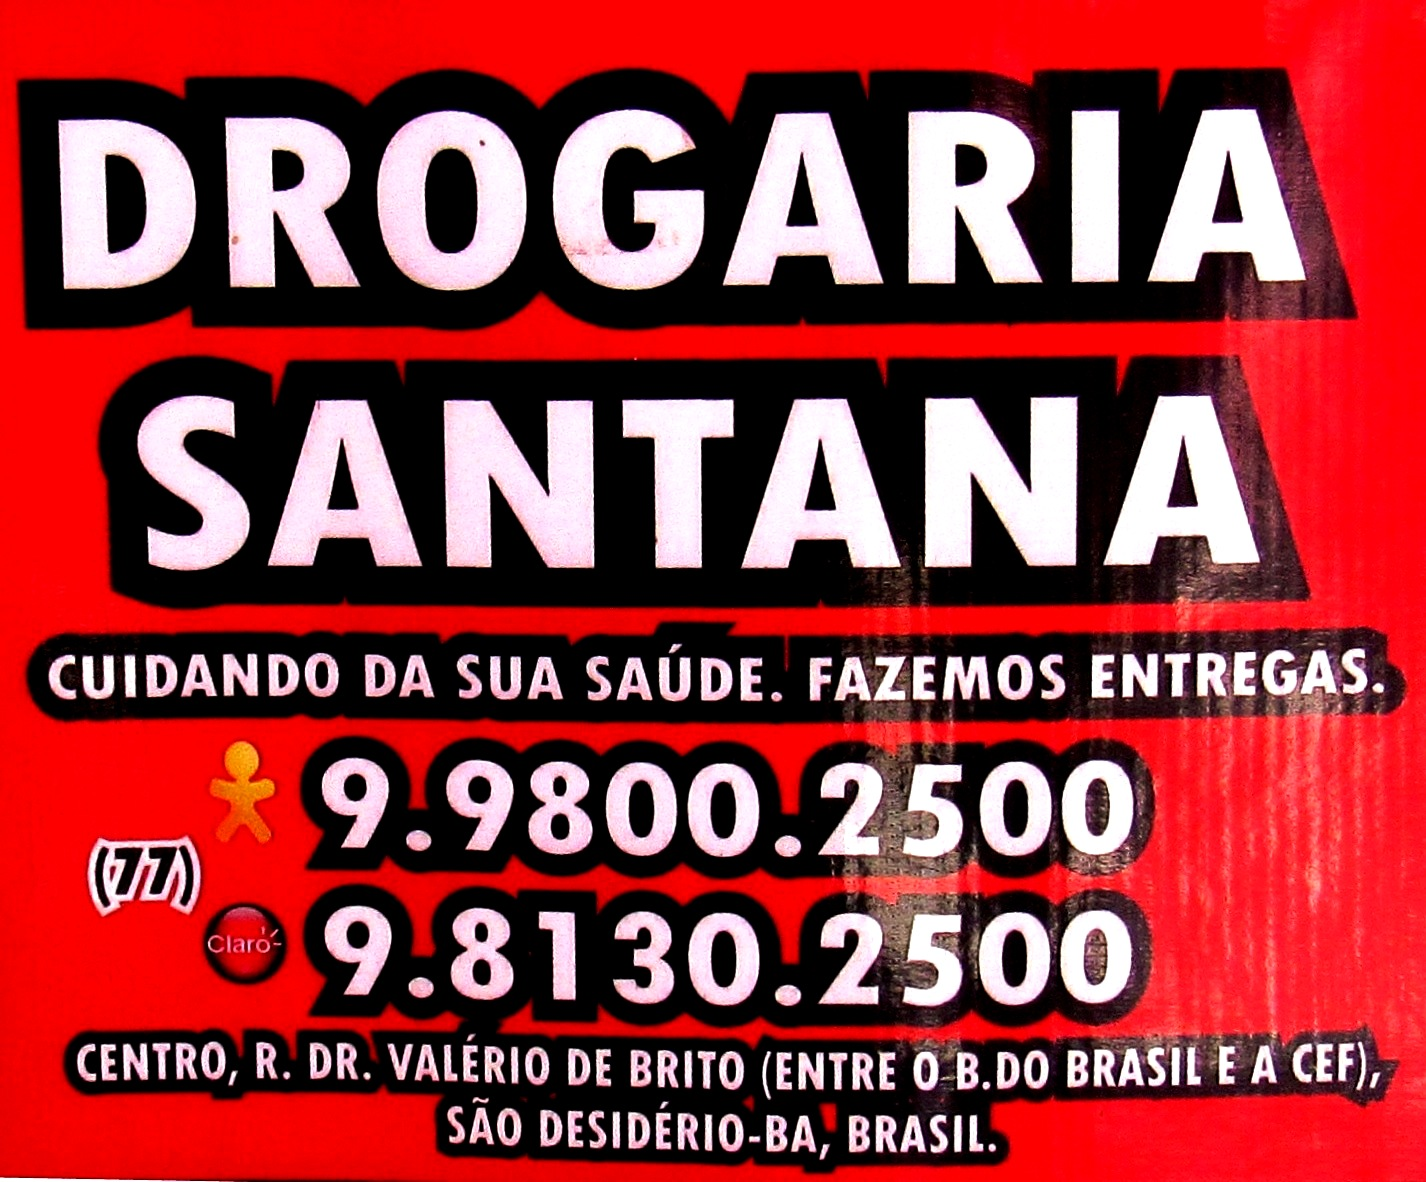 DROGARIA SANTANA